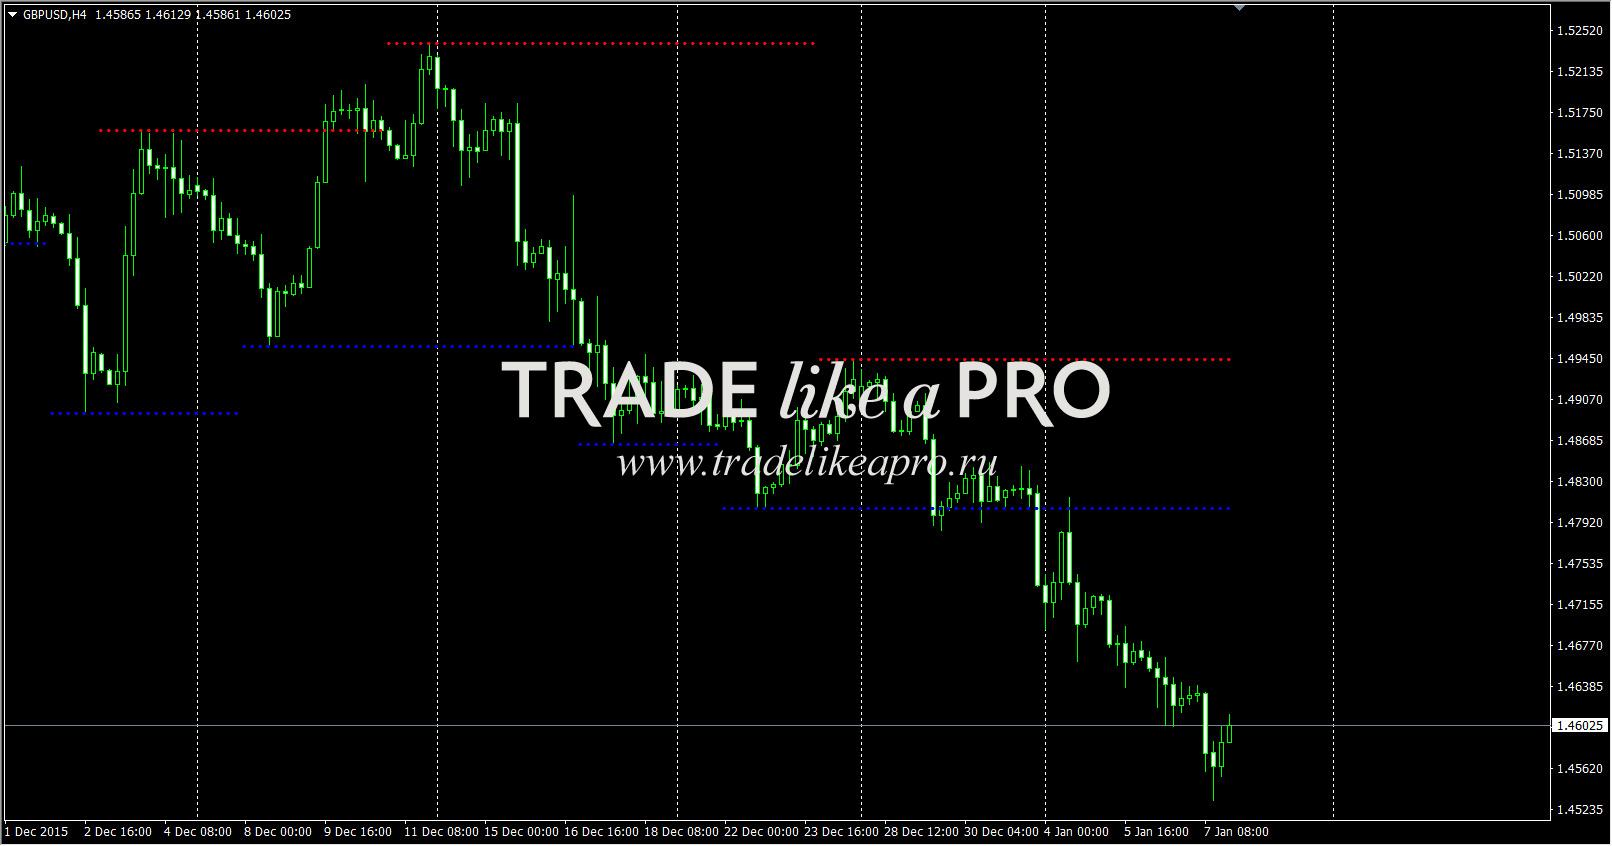 Forexsystems.ru rev trader pro